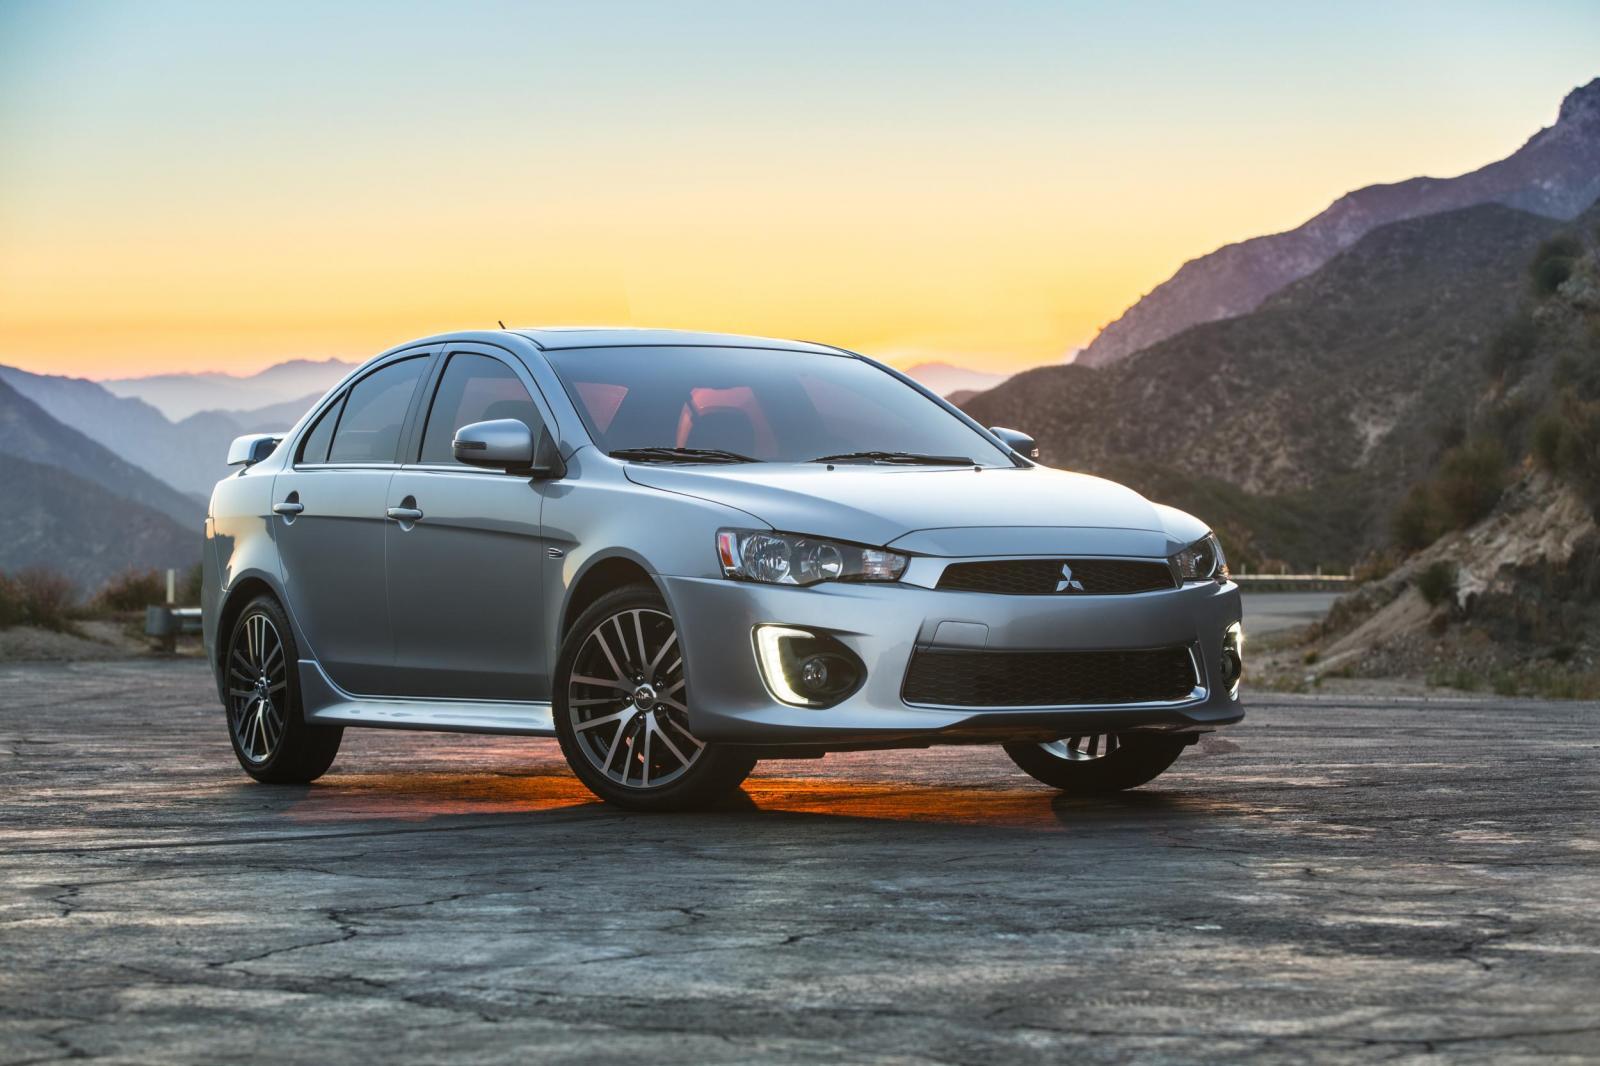 2016-Mitsubishi-Lancer-facelift-feature